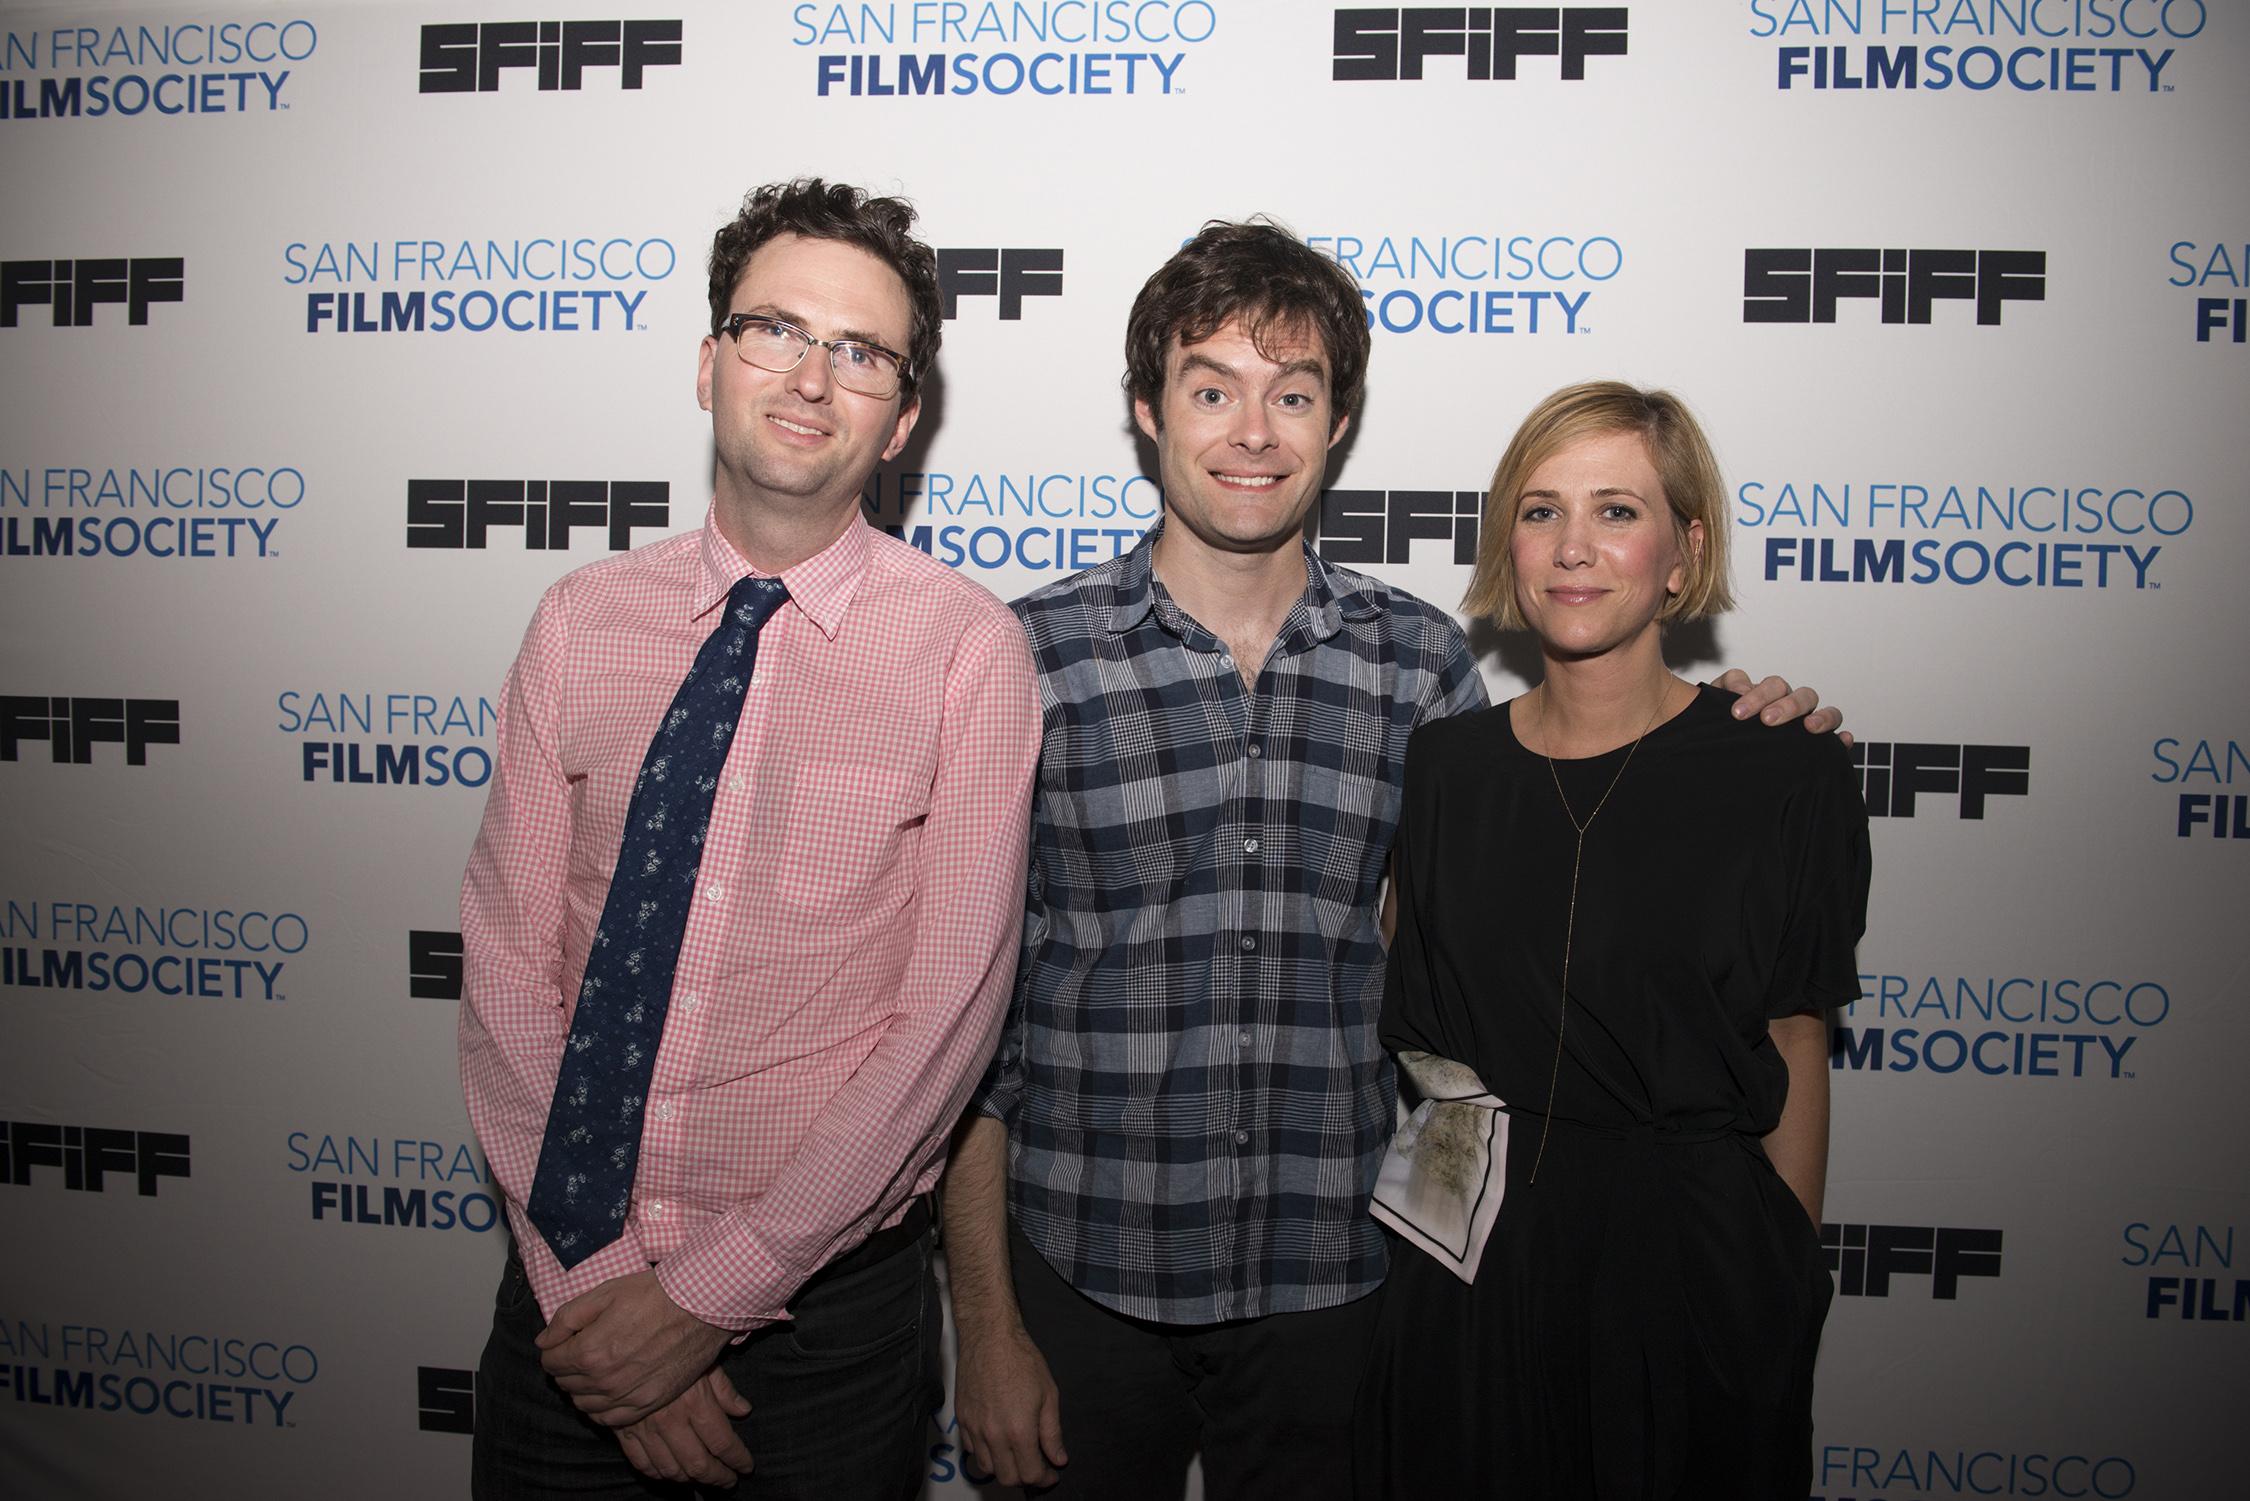 Director Craig Johnson with stars Bill Hader and Kristin Wiig